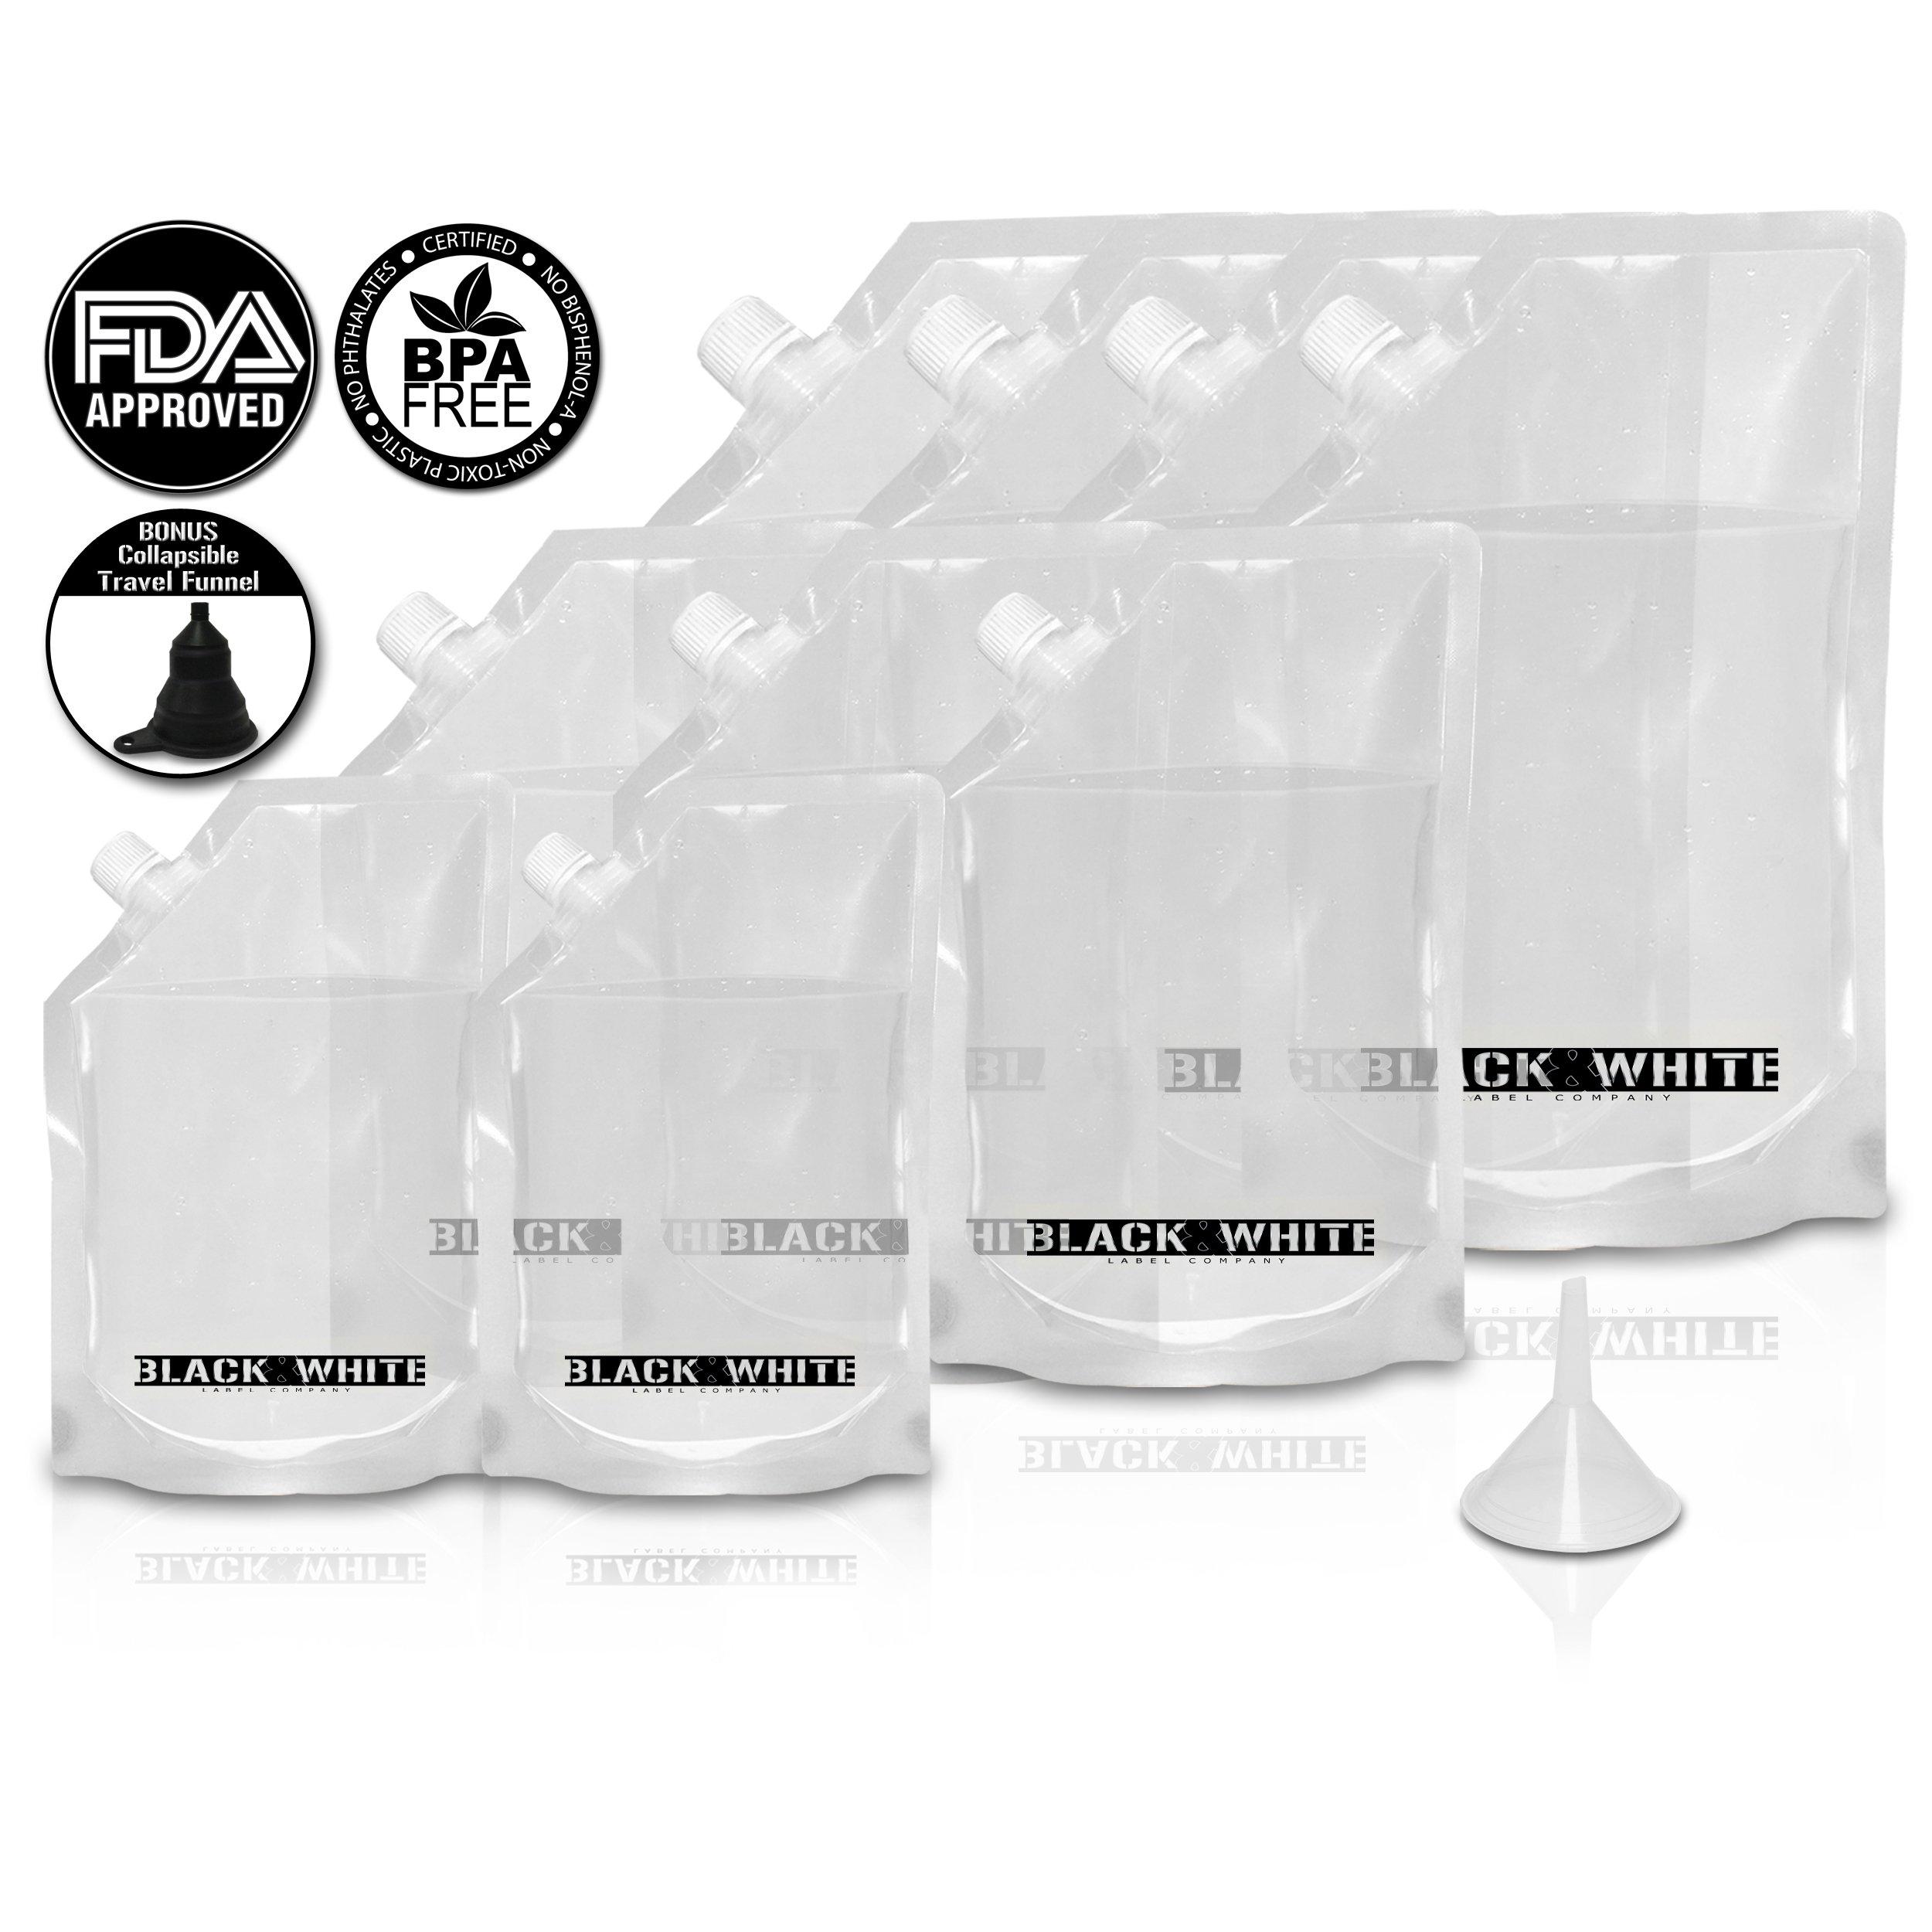 (9) Black & White Label Premium Plastic Flasks - Liquor Rum Runner Flask Cruise Kit Sneak Alcohol Drink Wine Pouch Bag Set Heavy Duty Reusable Concealable Flasks For Booze & Cocktails 4x32oz+3x16oz+2x8oz + Funnel